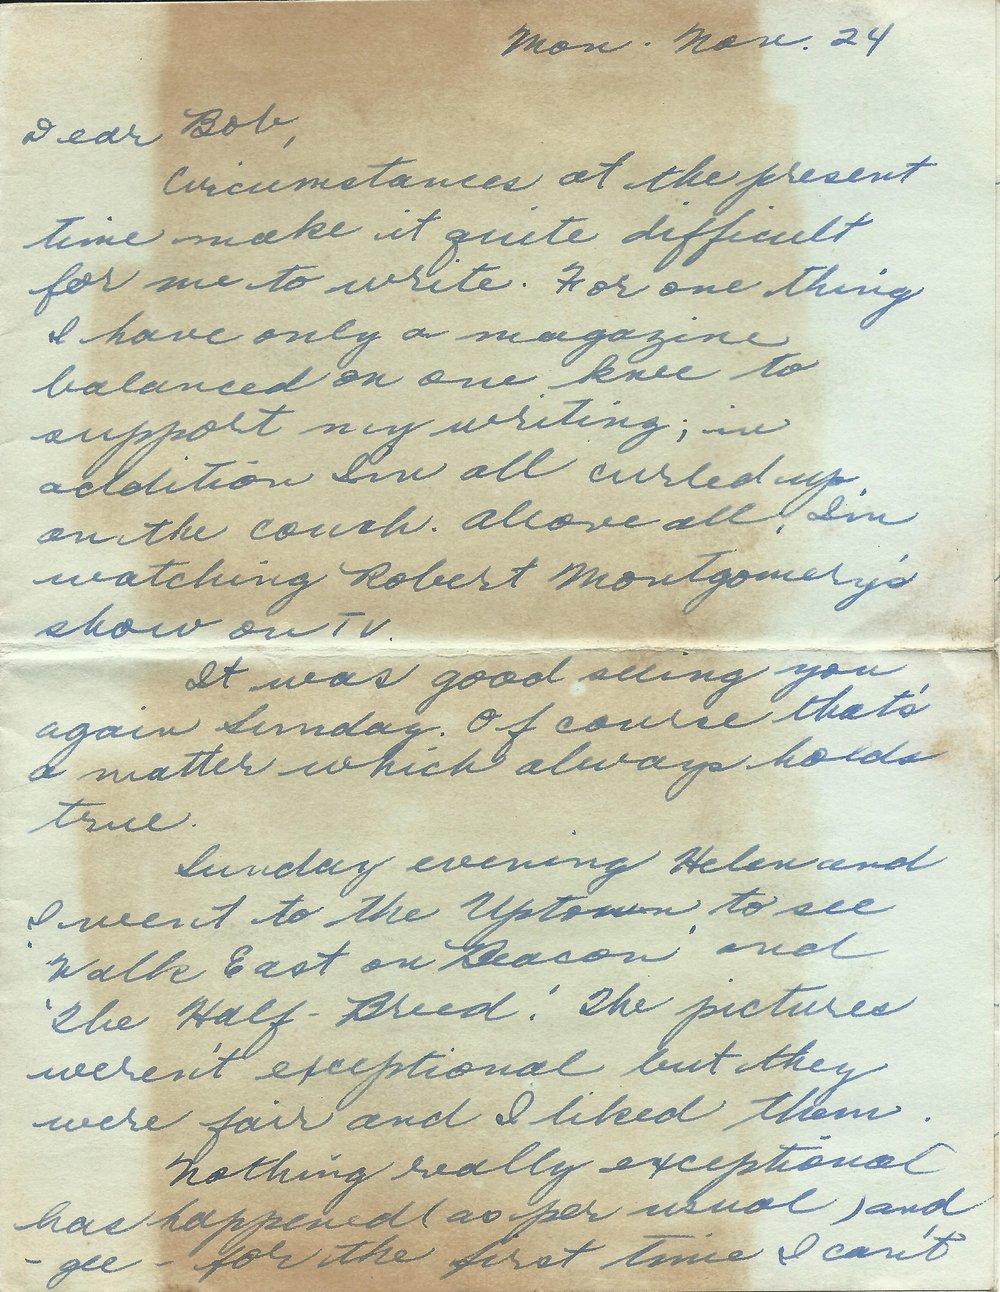 10. Nov. 24, 1952 (Oma)_Page_2.jpg